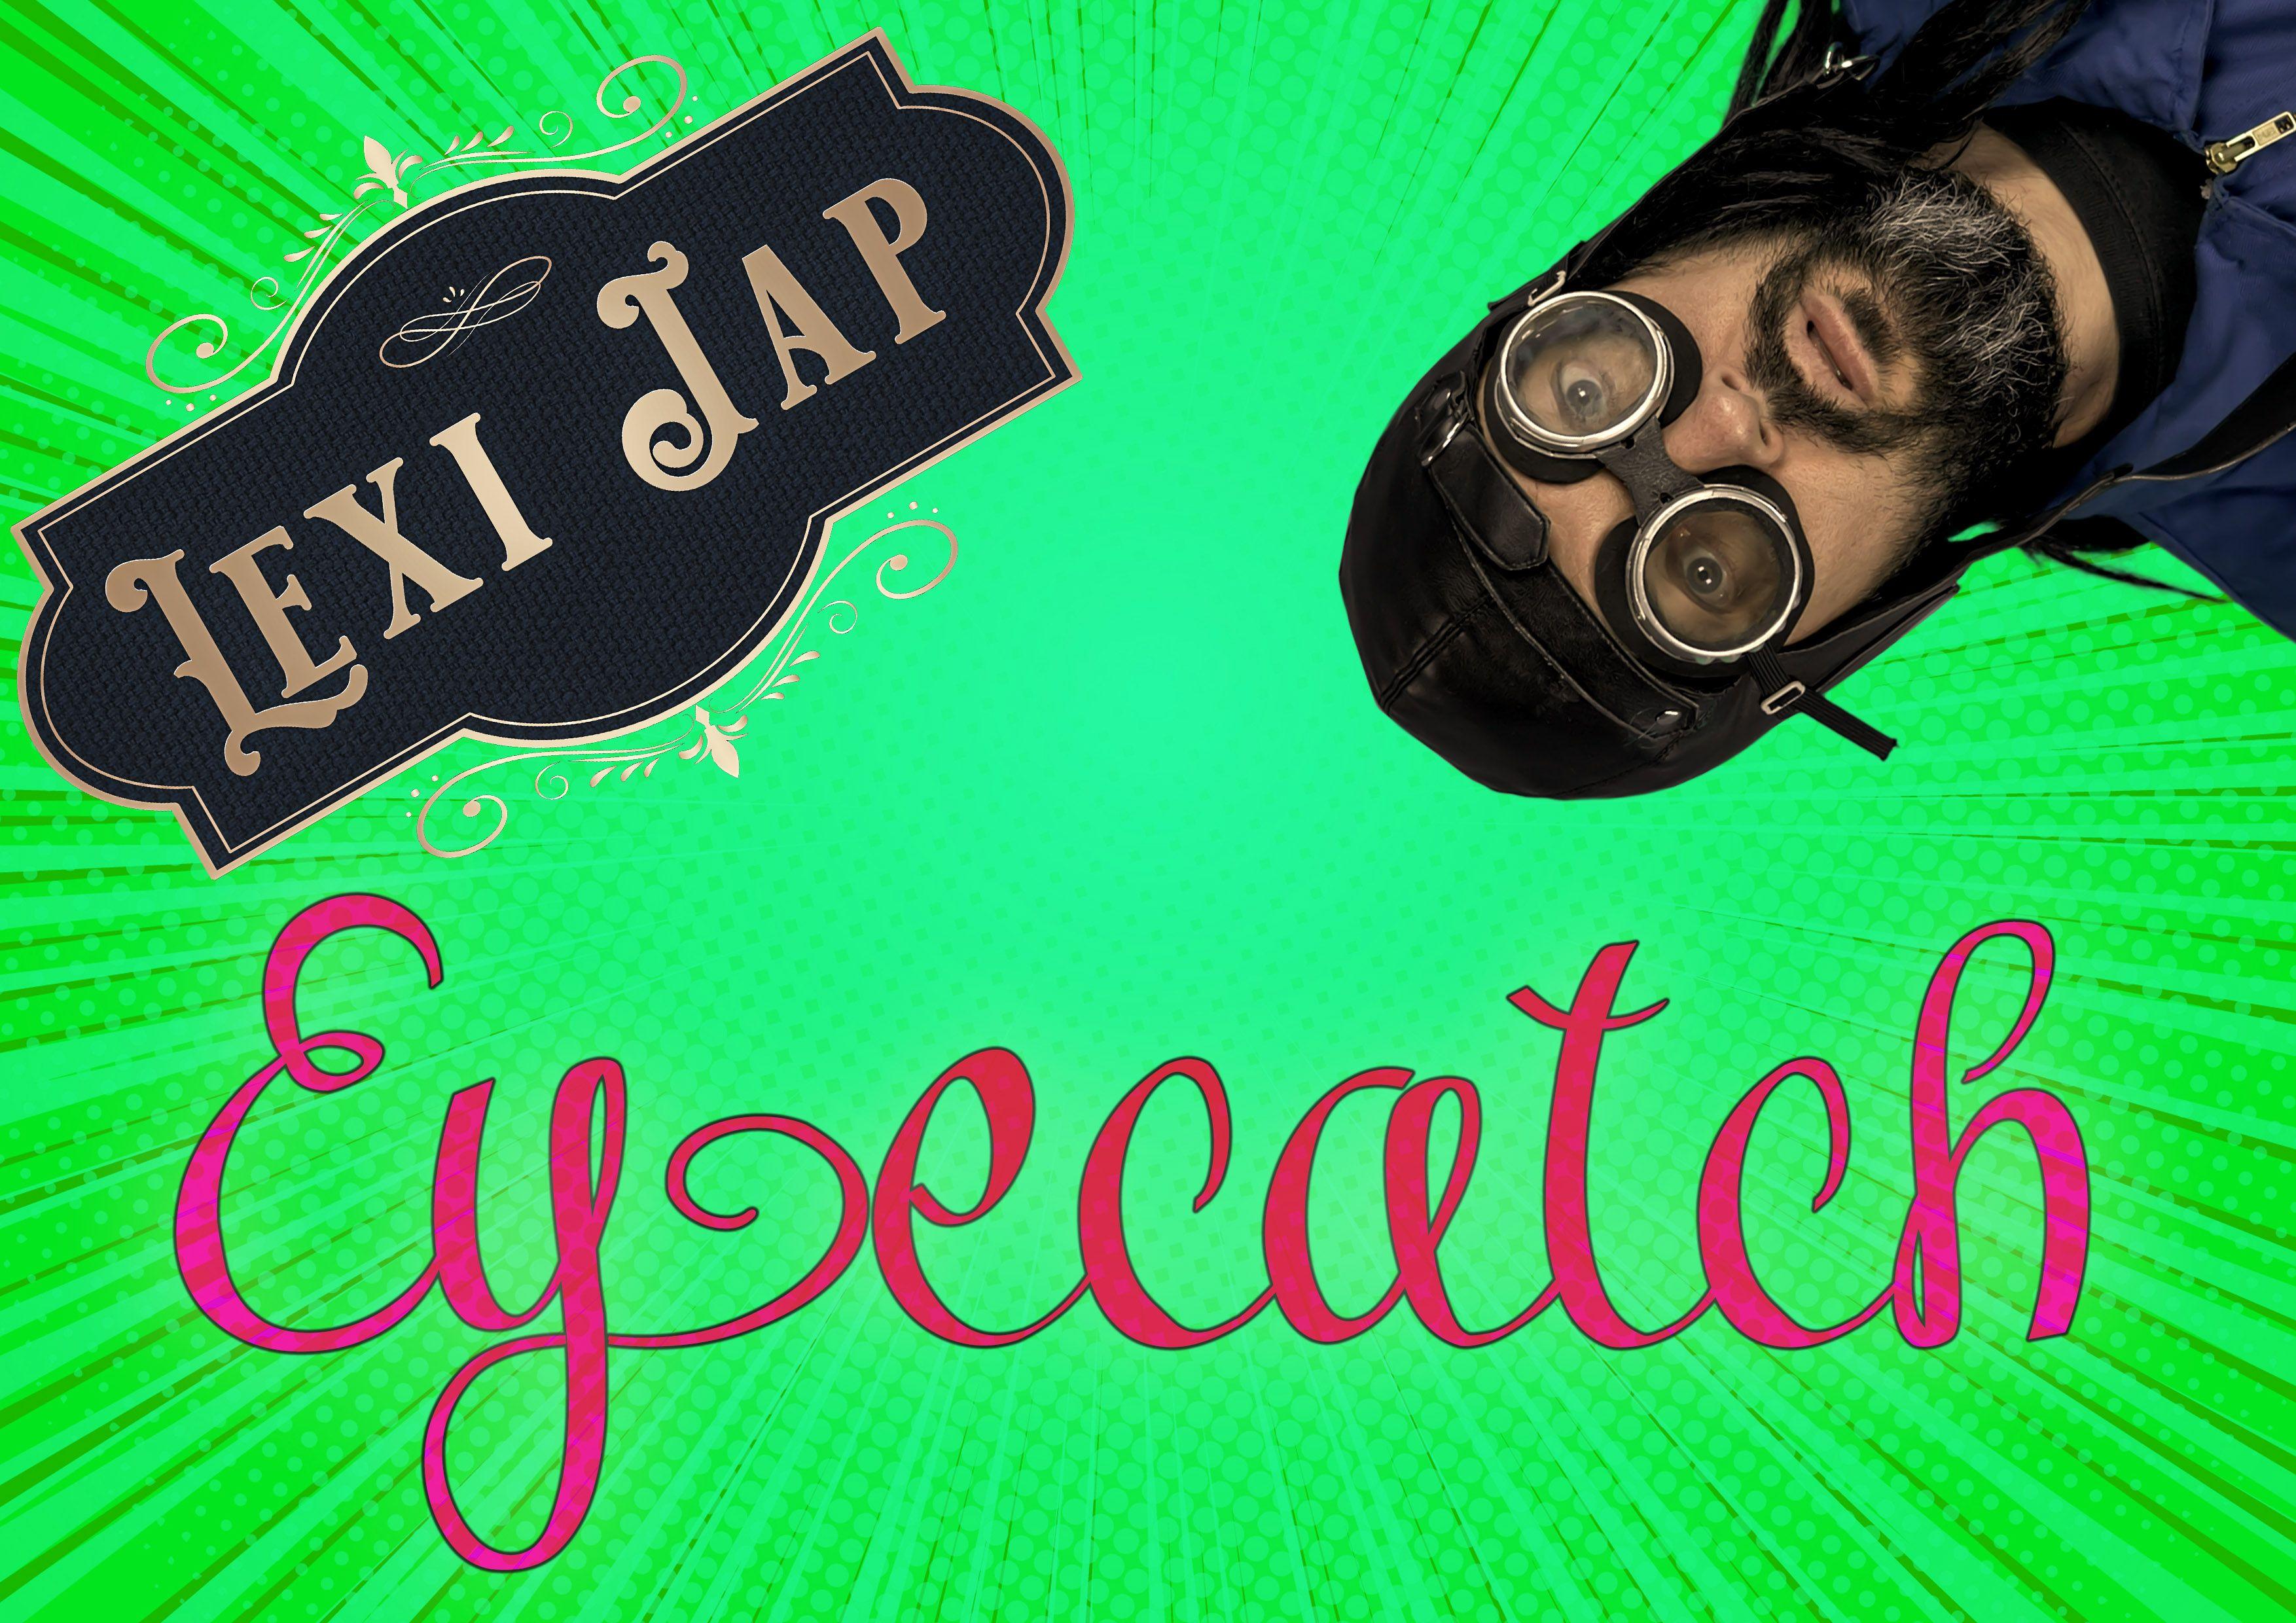 LexiJap-Eyecatch.jpg